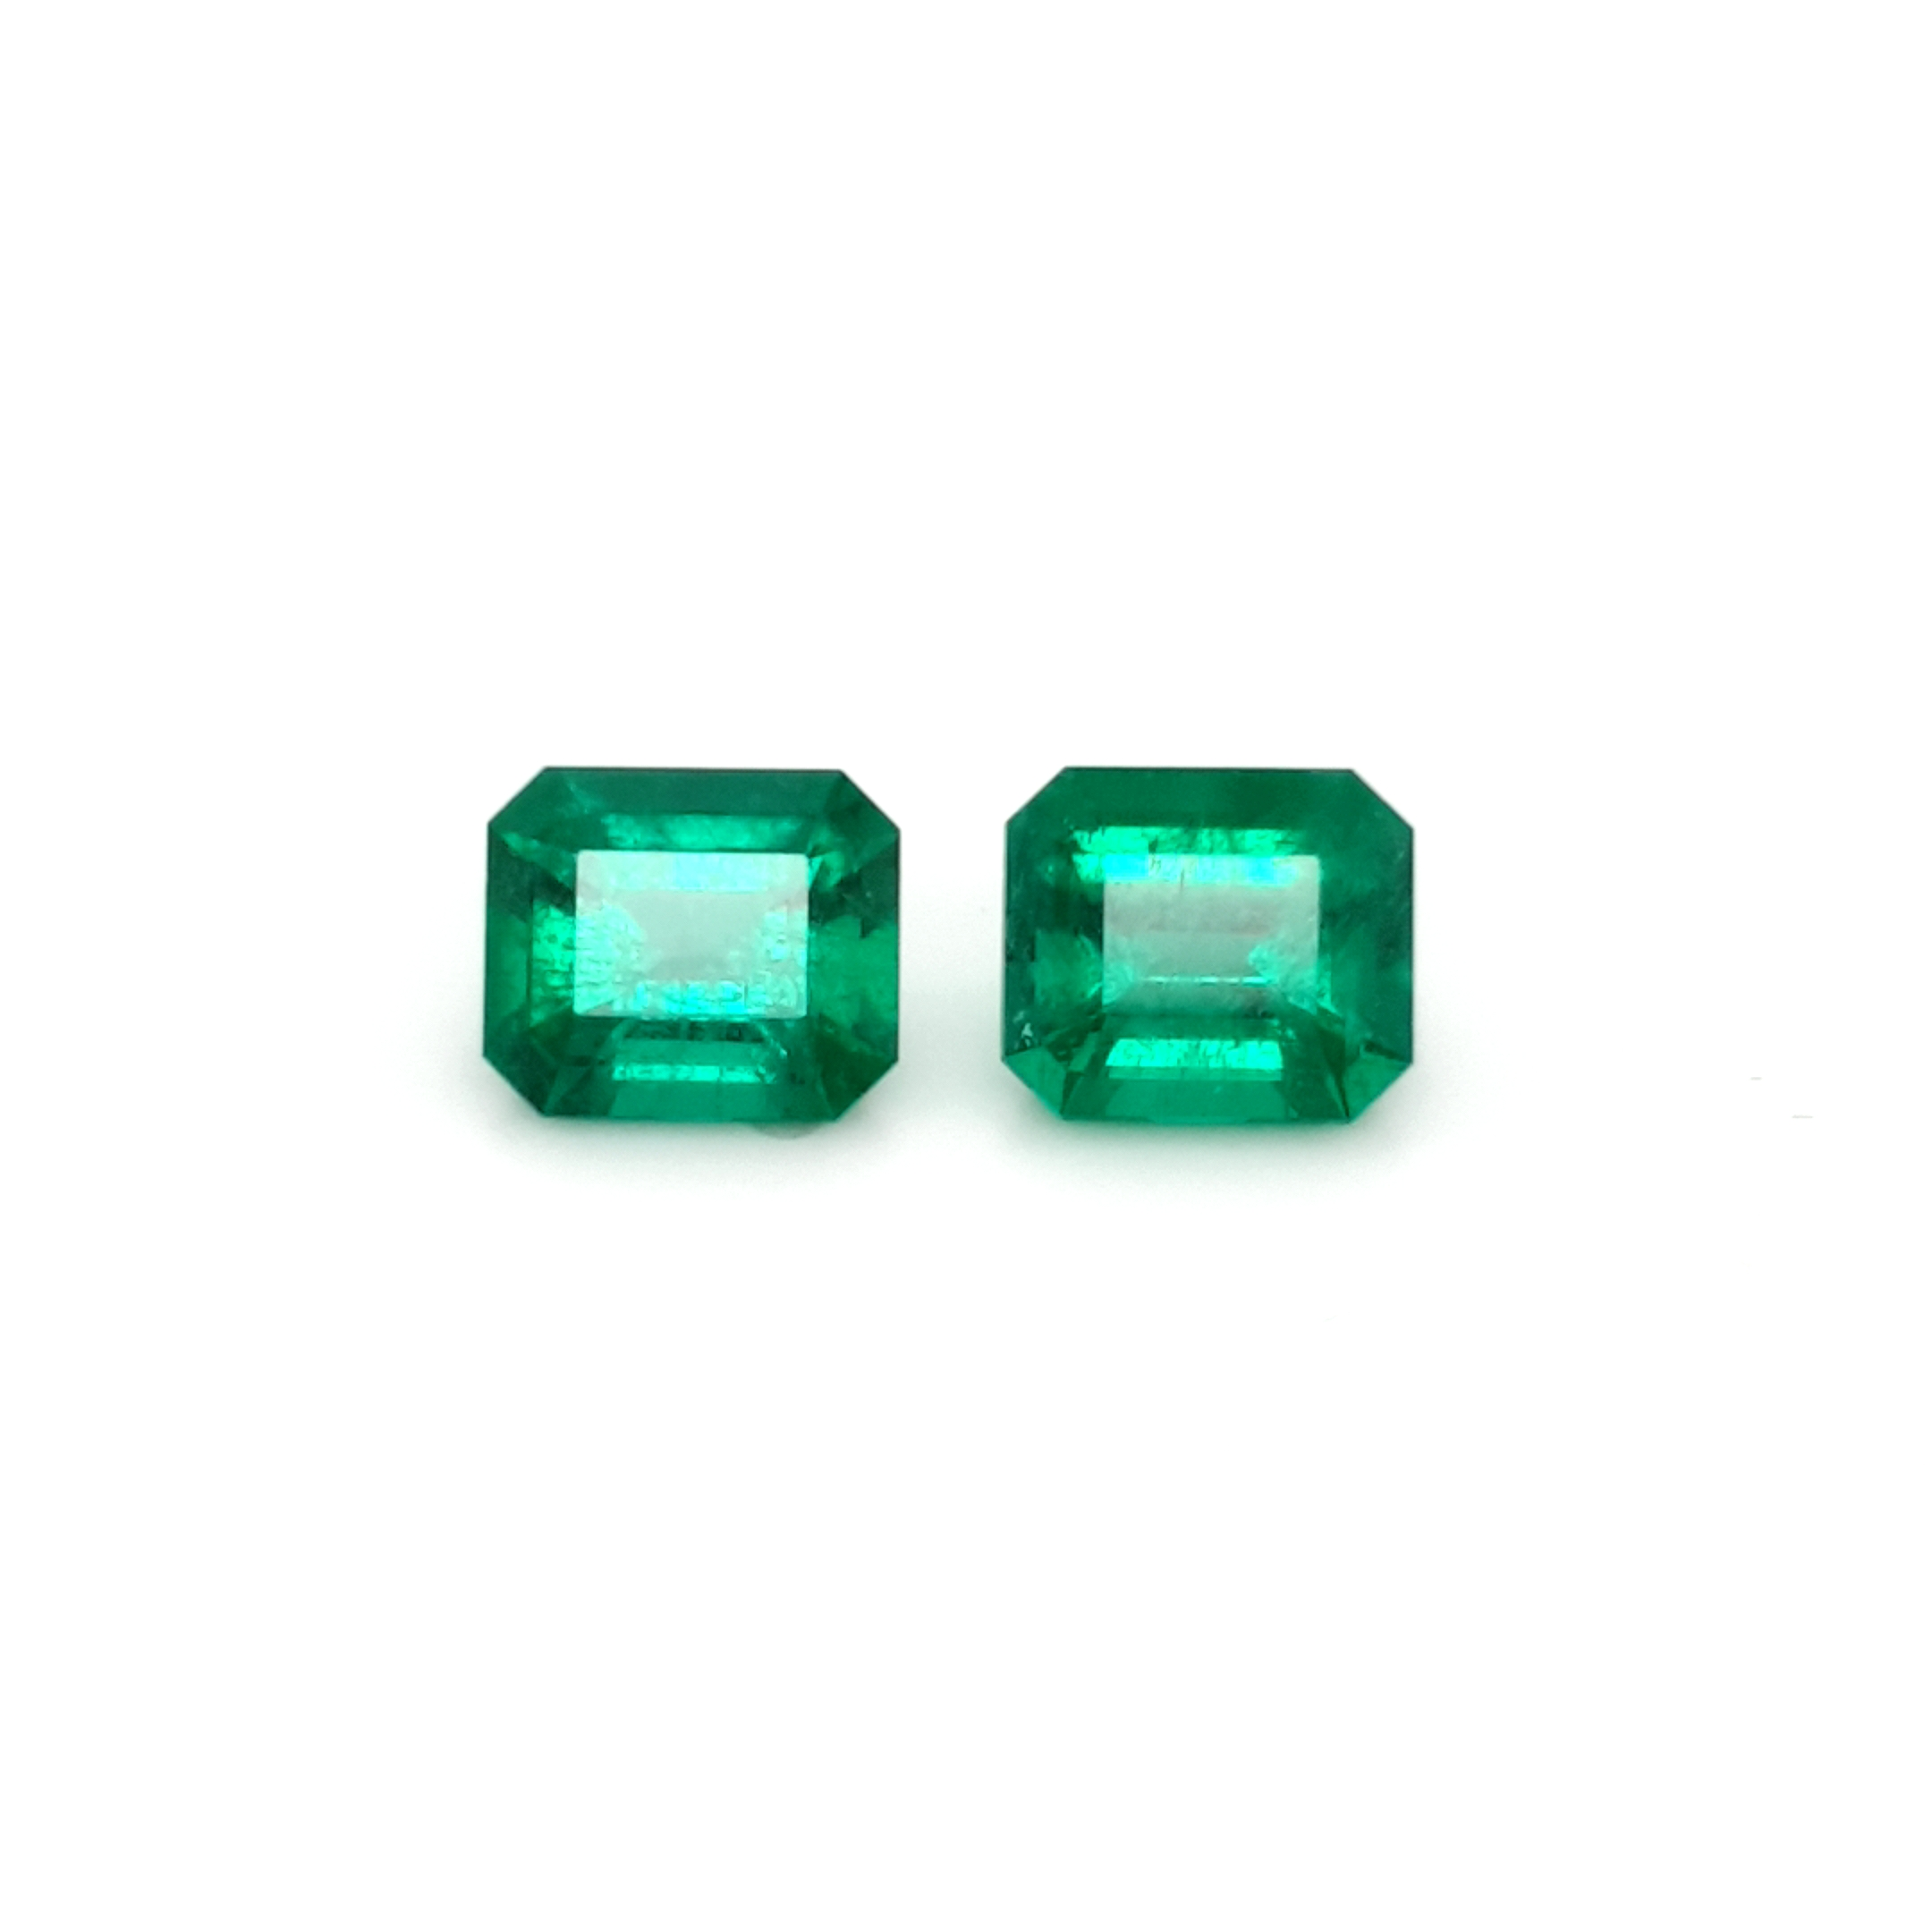 7,39ct. Pair Emerald from Colombia MuzoGreen cert. EML20D1 ClaudiaHamann__2021-03-24-14-27-10